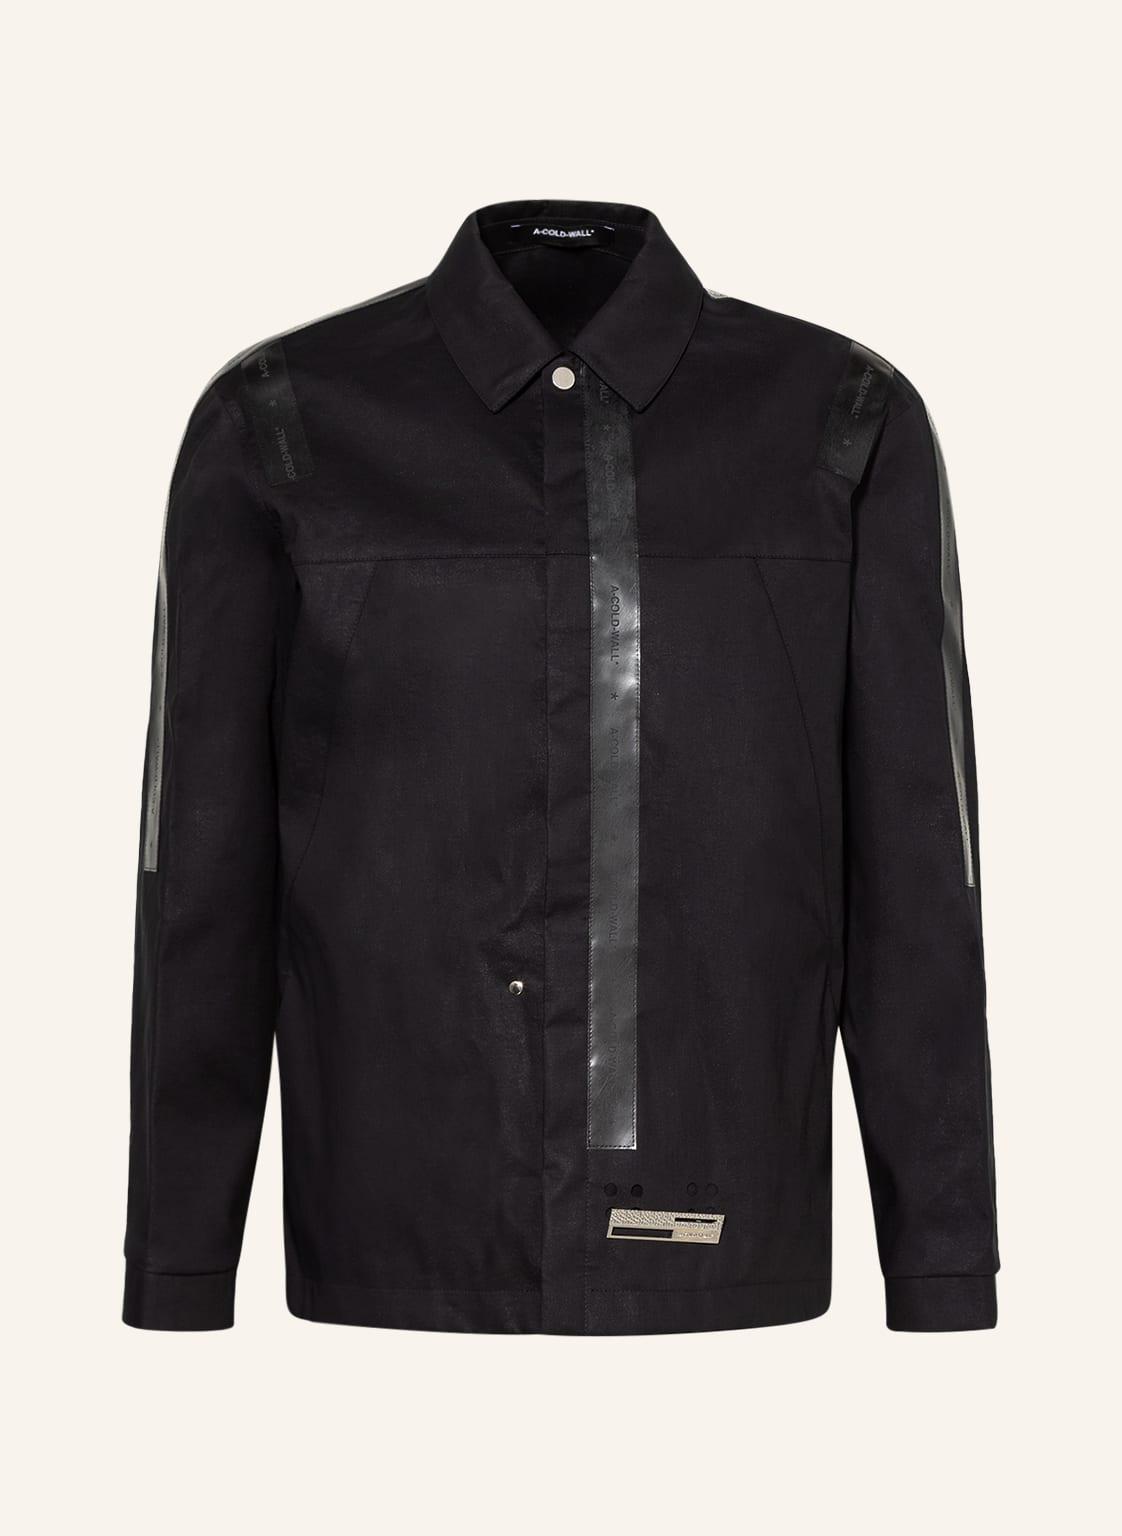 Image of A-Cold-Wall* Overshirt Mackintosh schwarz